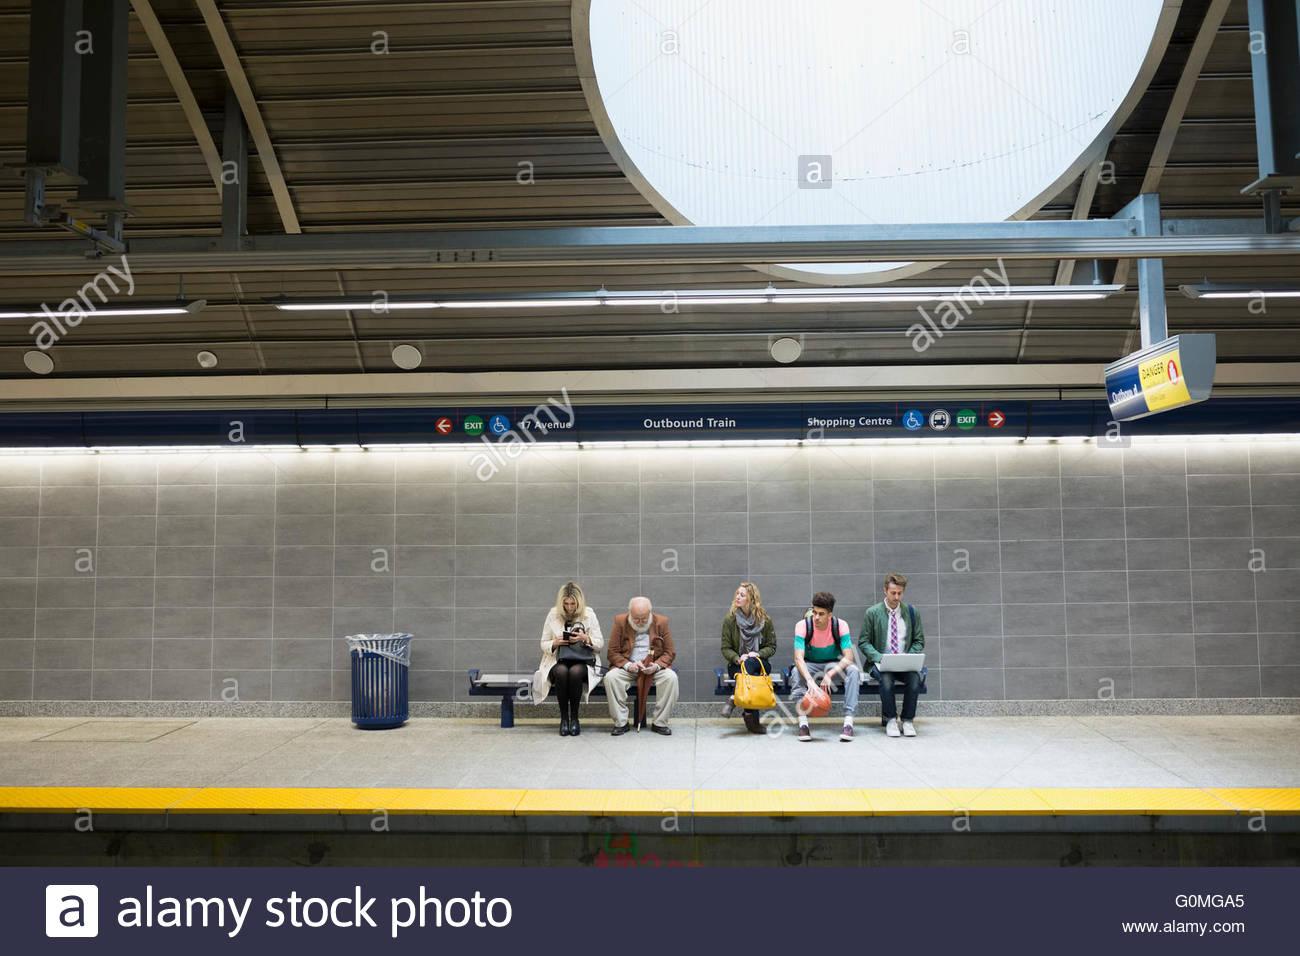 People waiting on benches on subway station platform - Stock Image